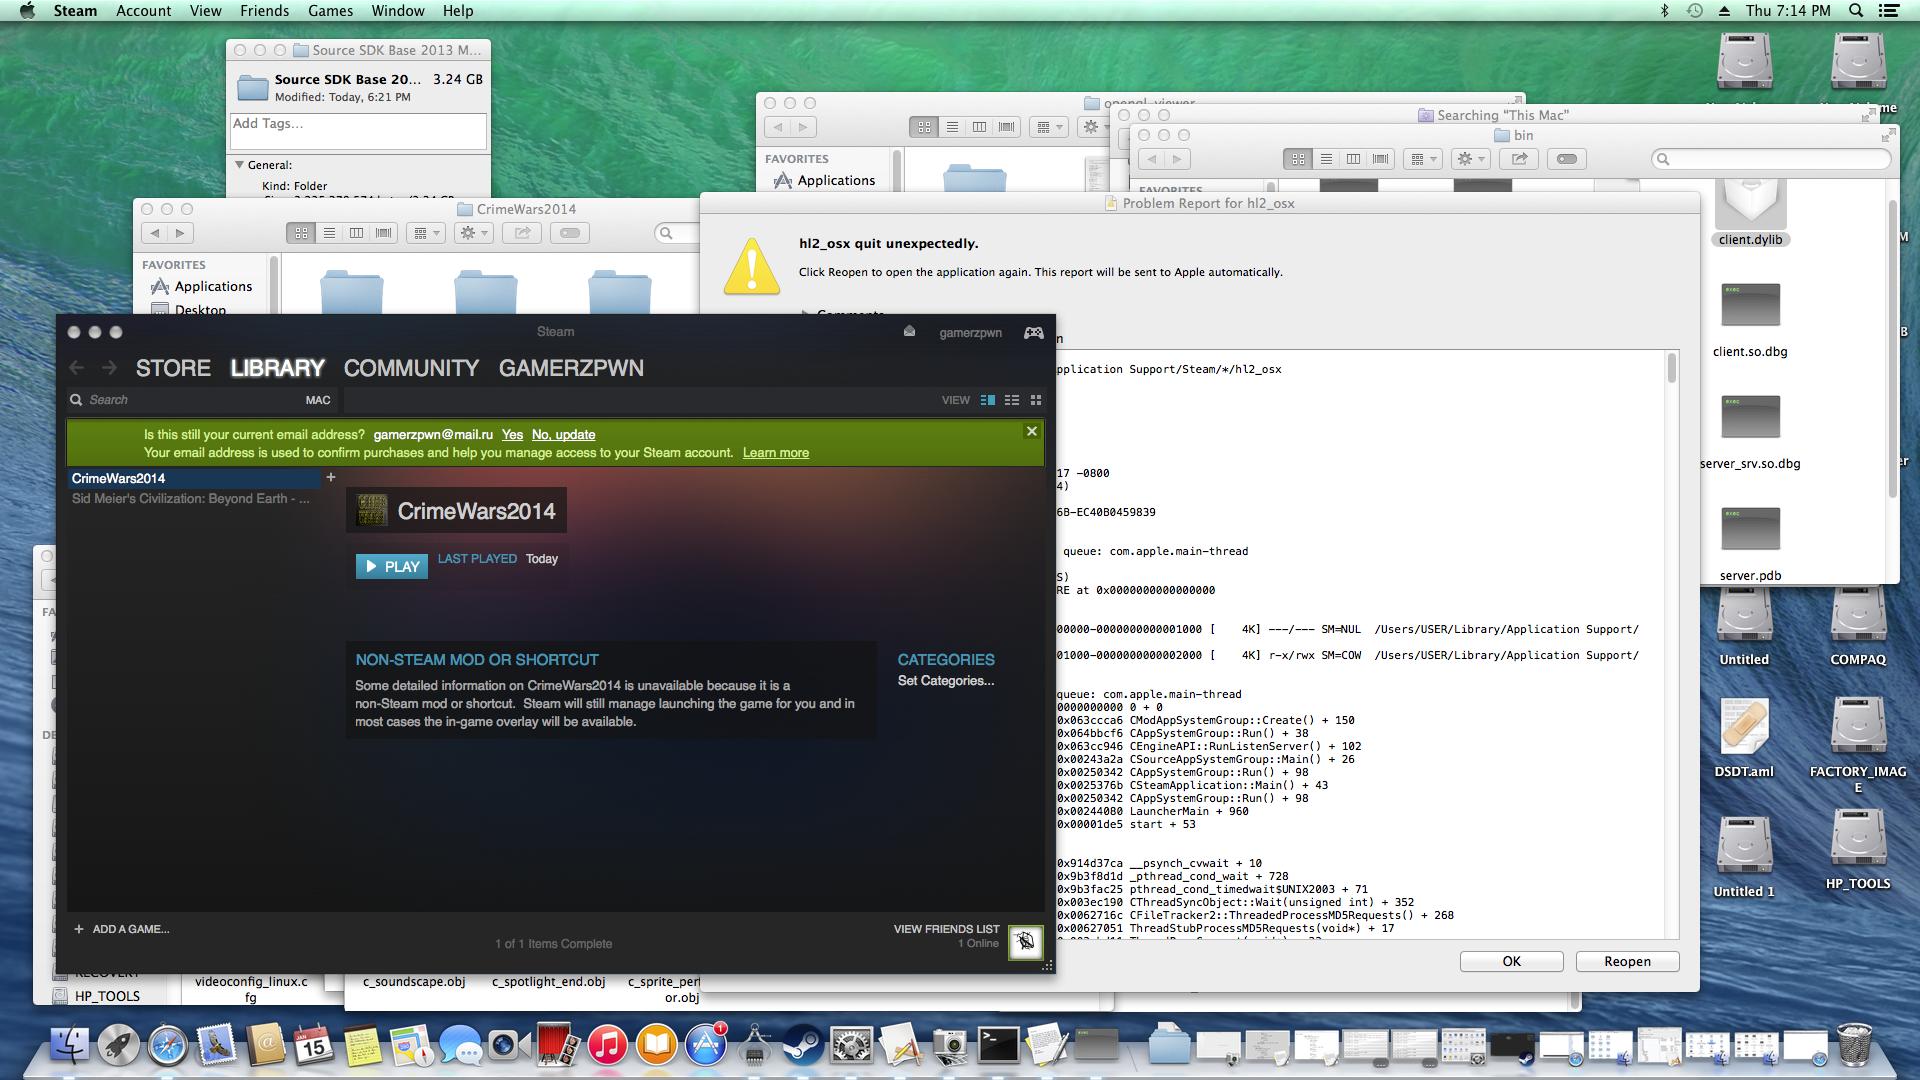 Mac coming soon! Got OpenGL to work on Hackingtosh! news